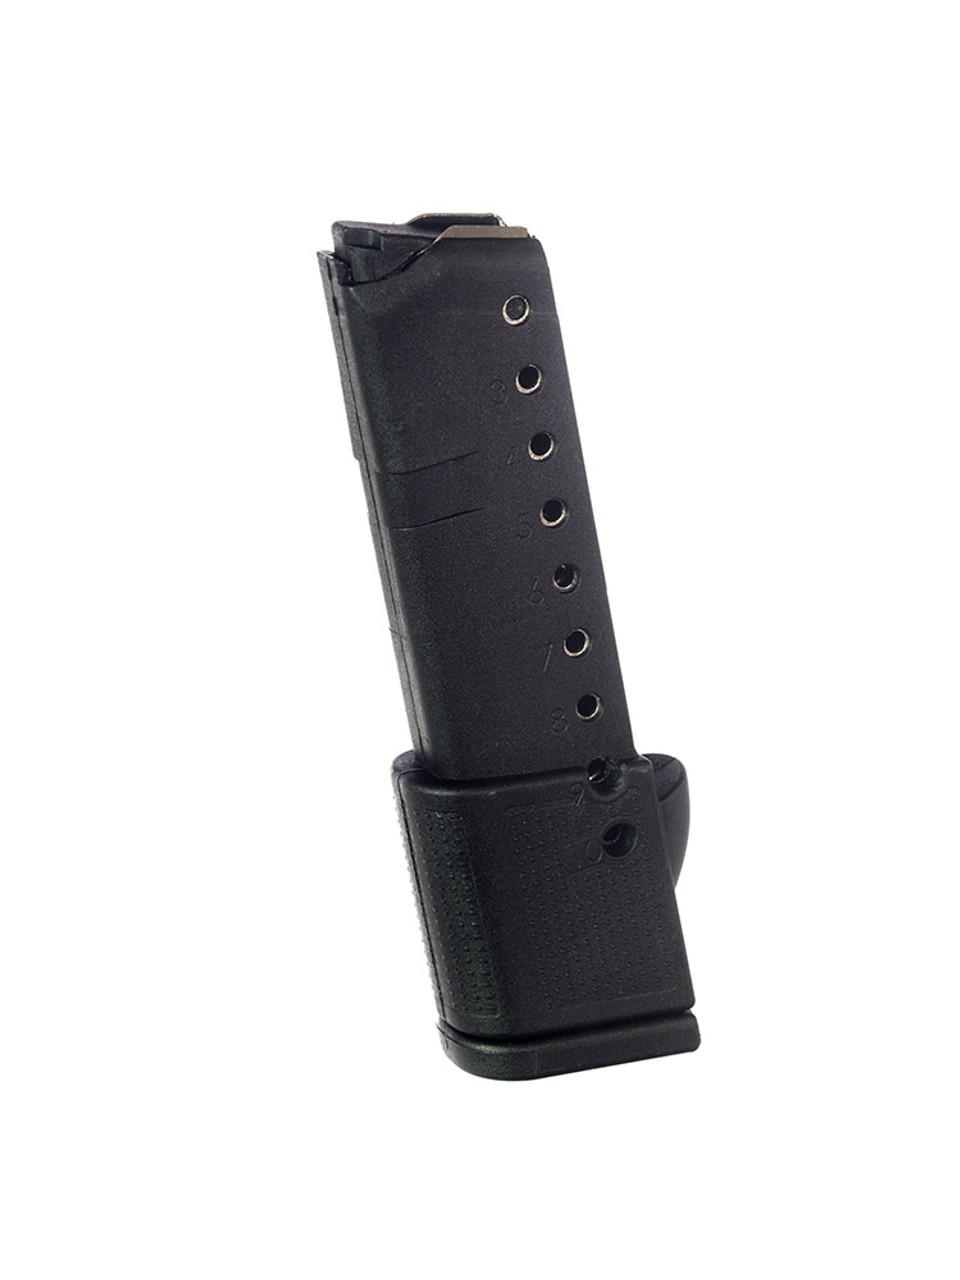 Fits the Glock® Model 42 .380 ACP (10) Rd - Black Polymer